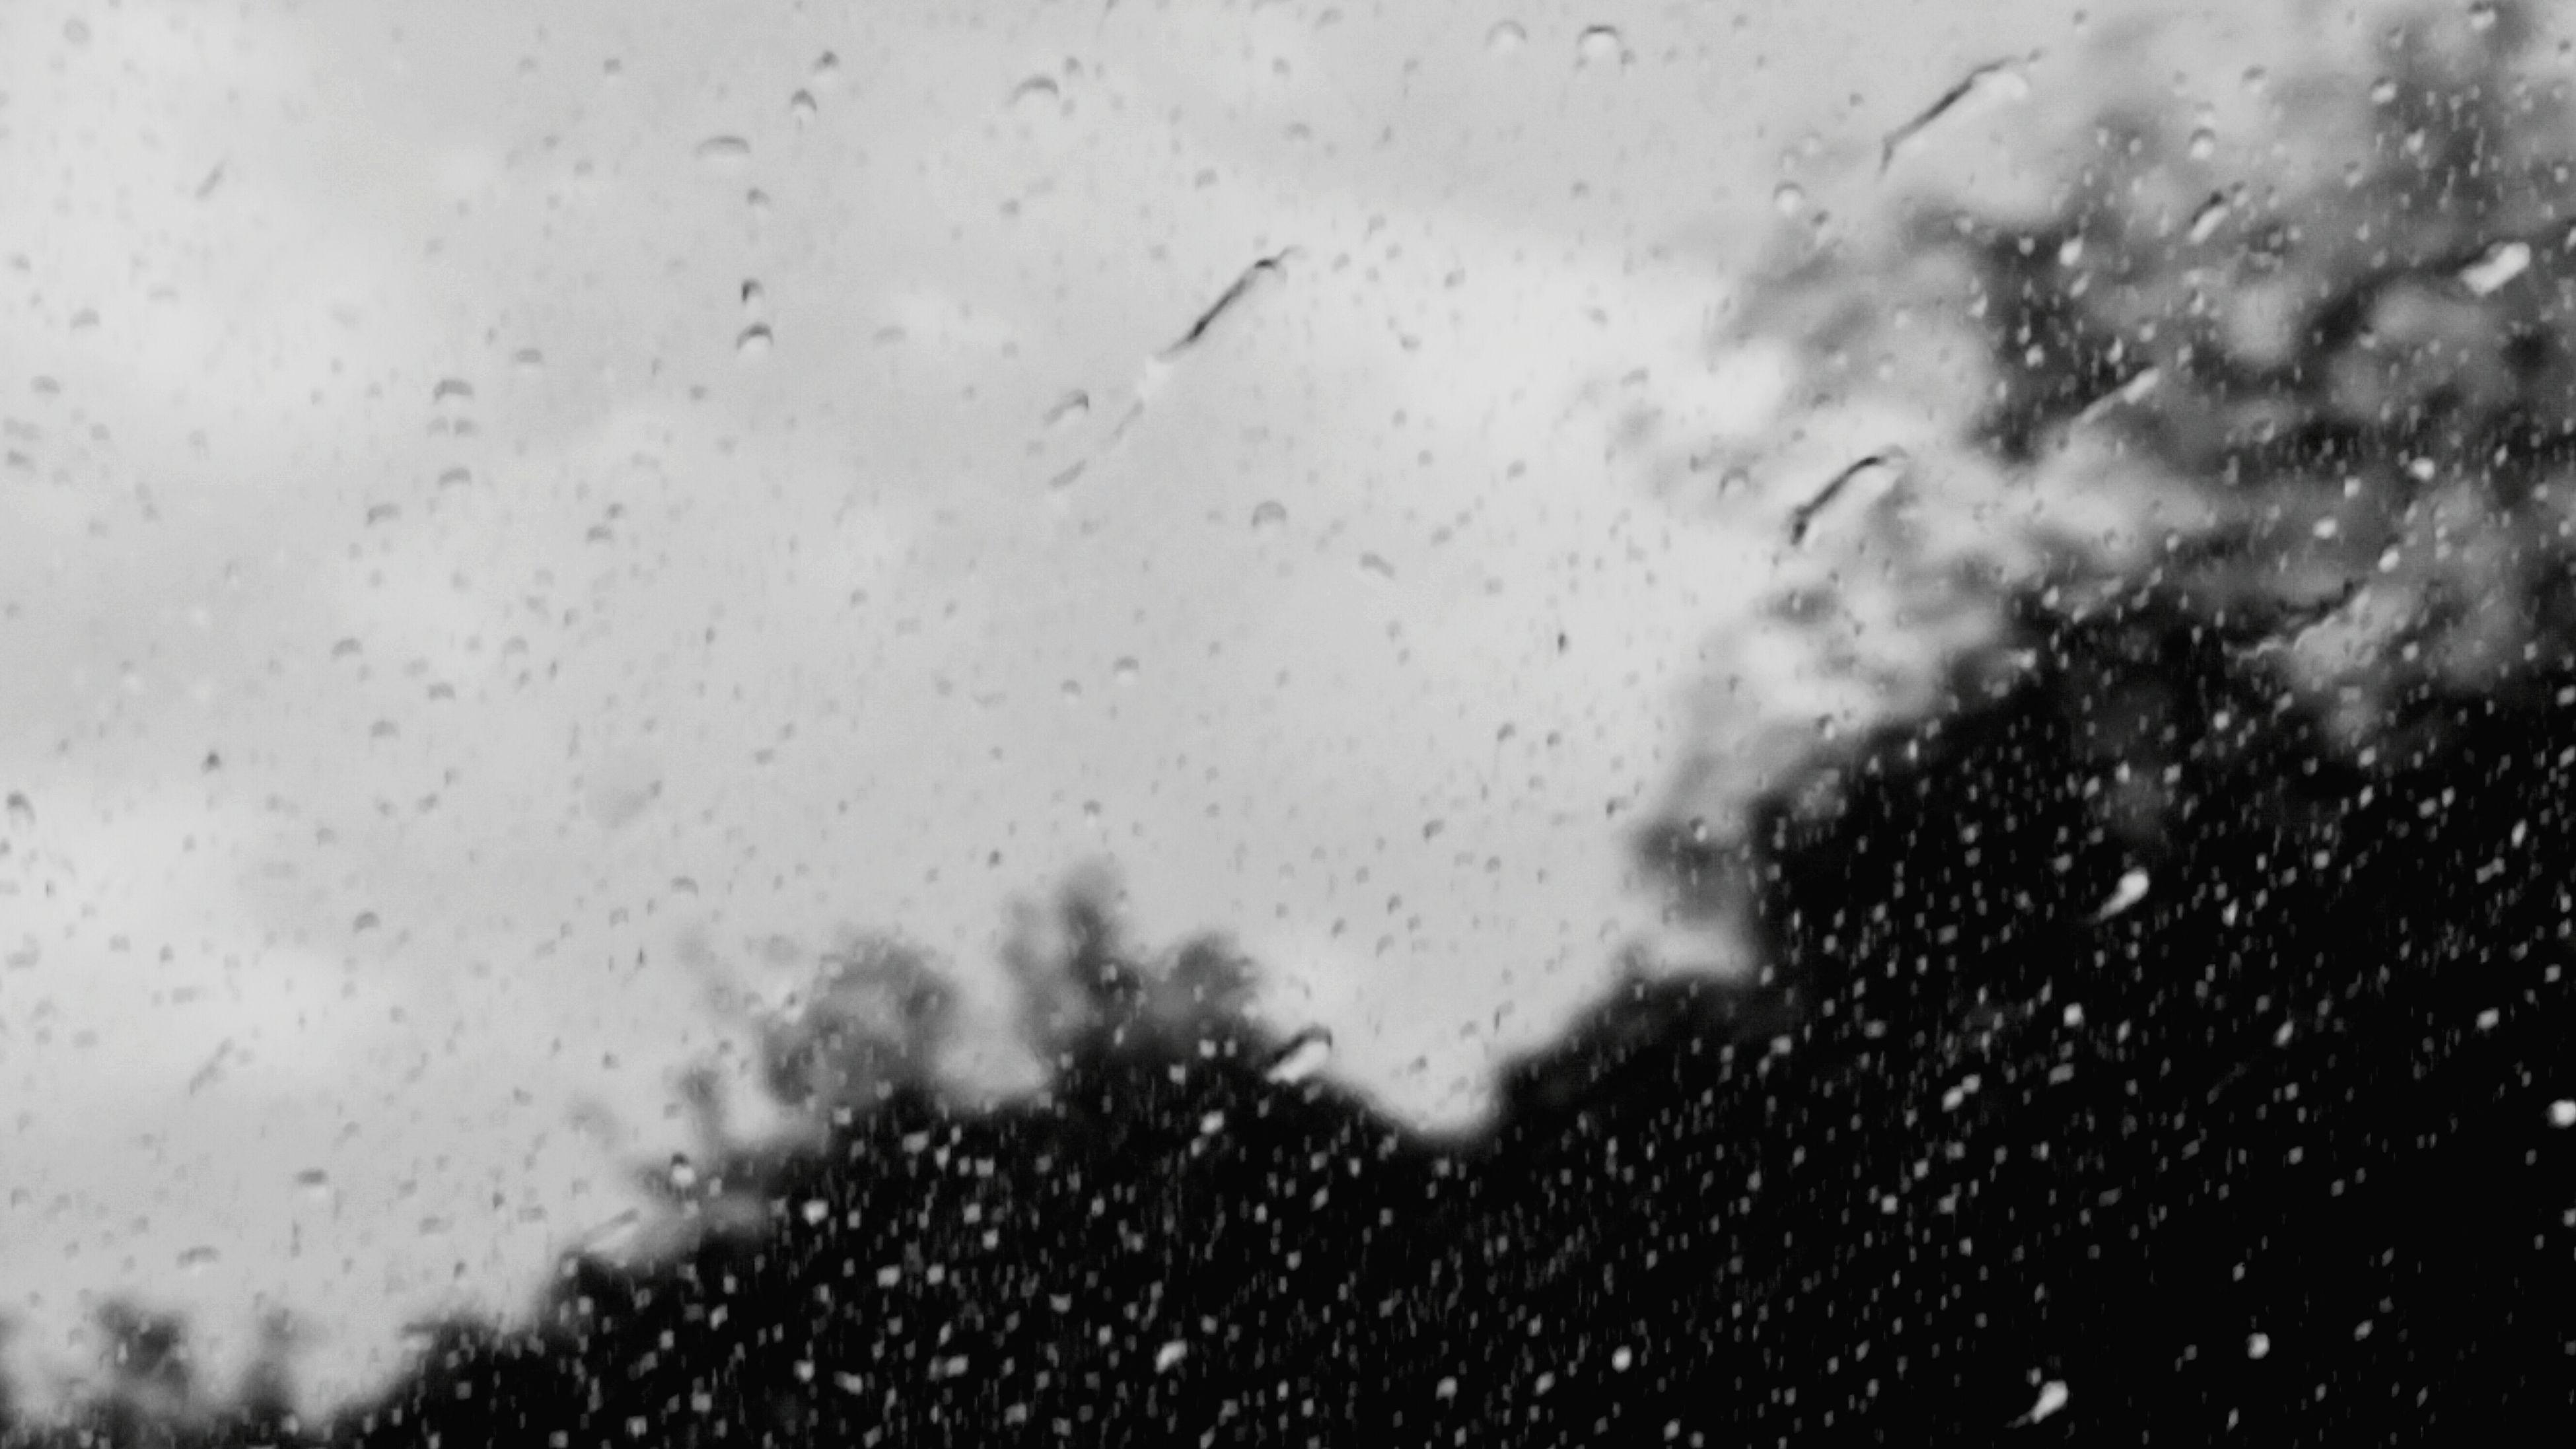 drop, wet, rain, window, water, transparent, weather, glass - material, sky, indoors, raindrop, backgrounds, full frame, season, silhouette, glass, monsoon, dusk, nature, cloud - sky